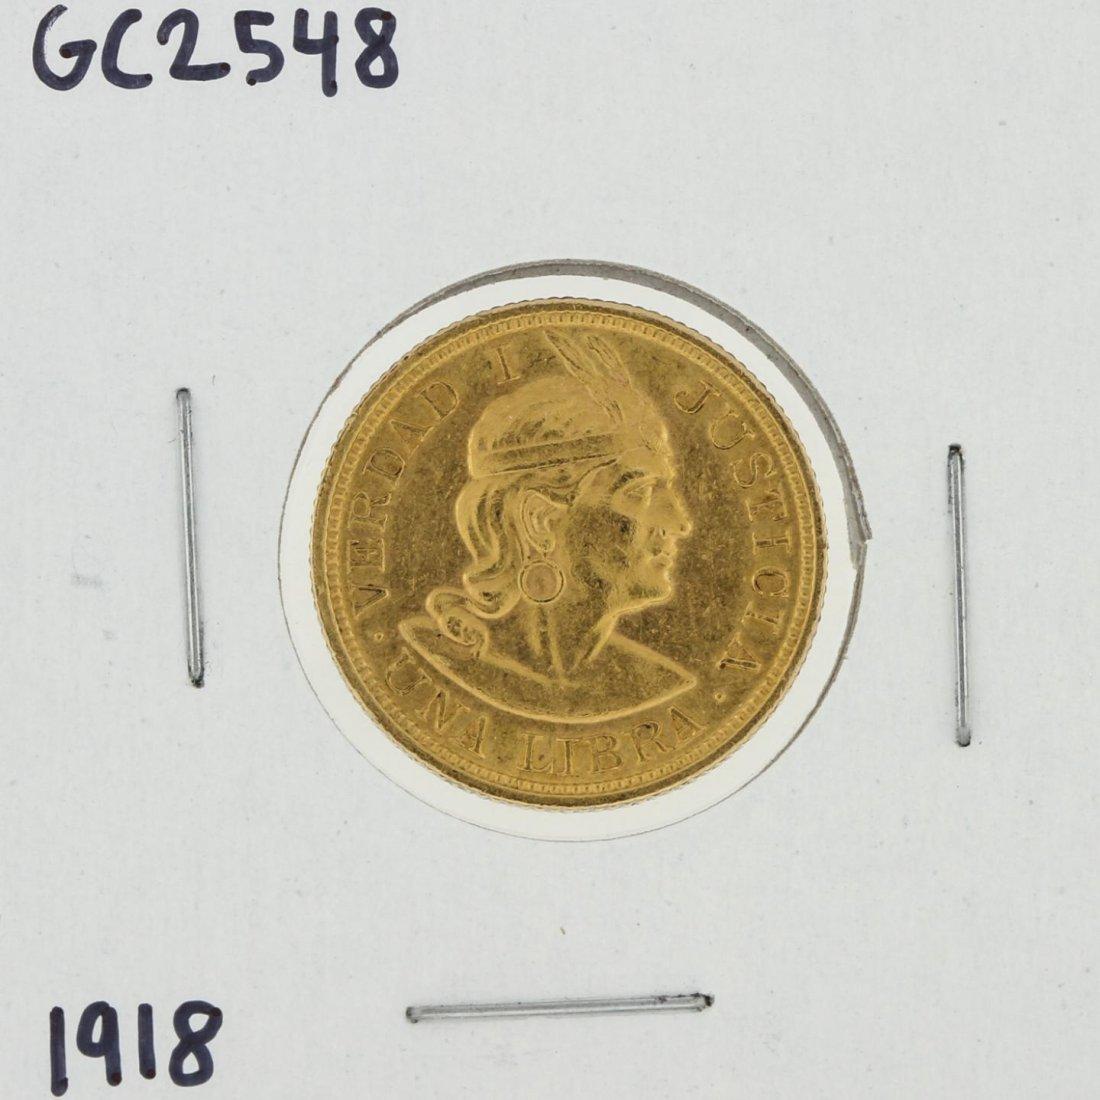 1918 Una Libra Gold Coin GC2548